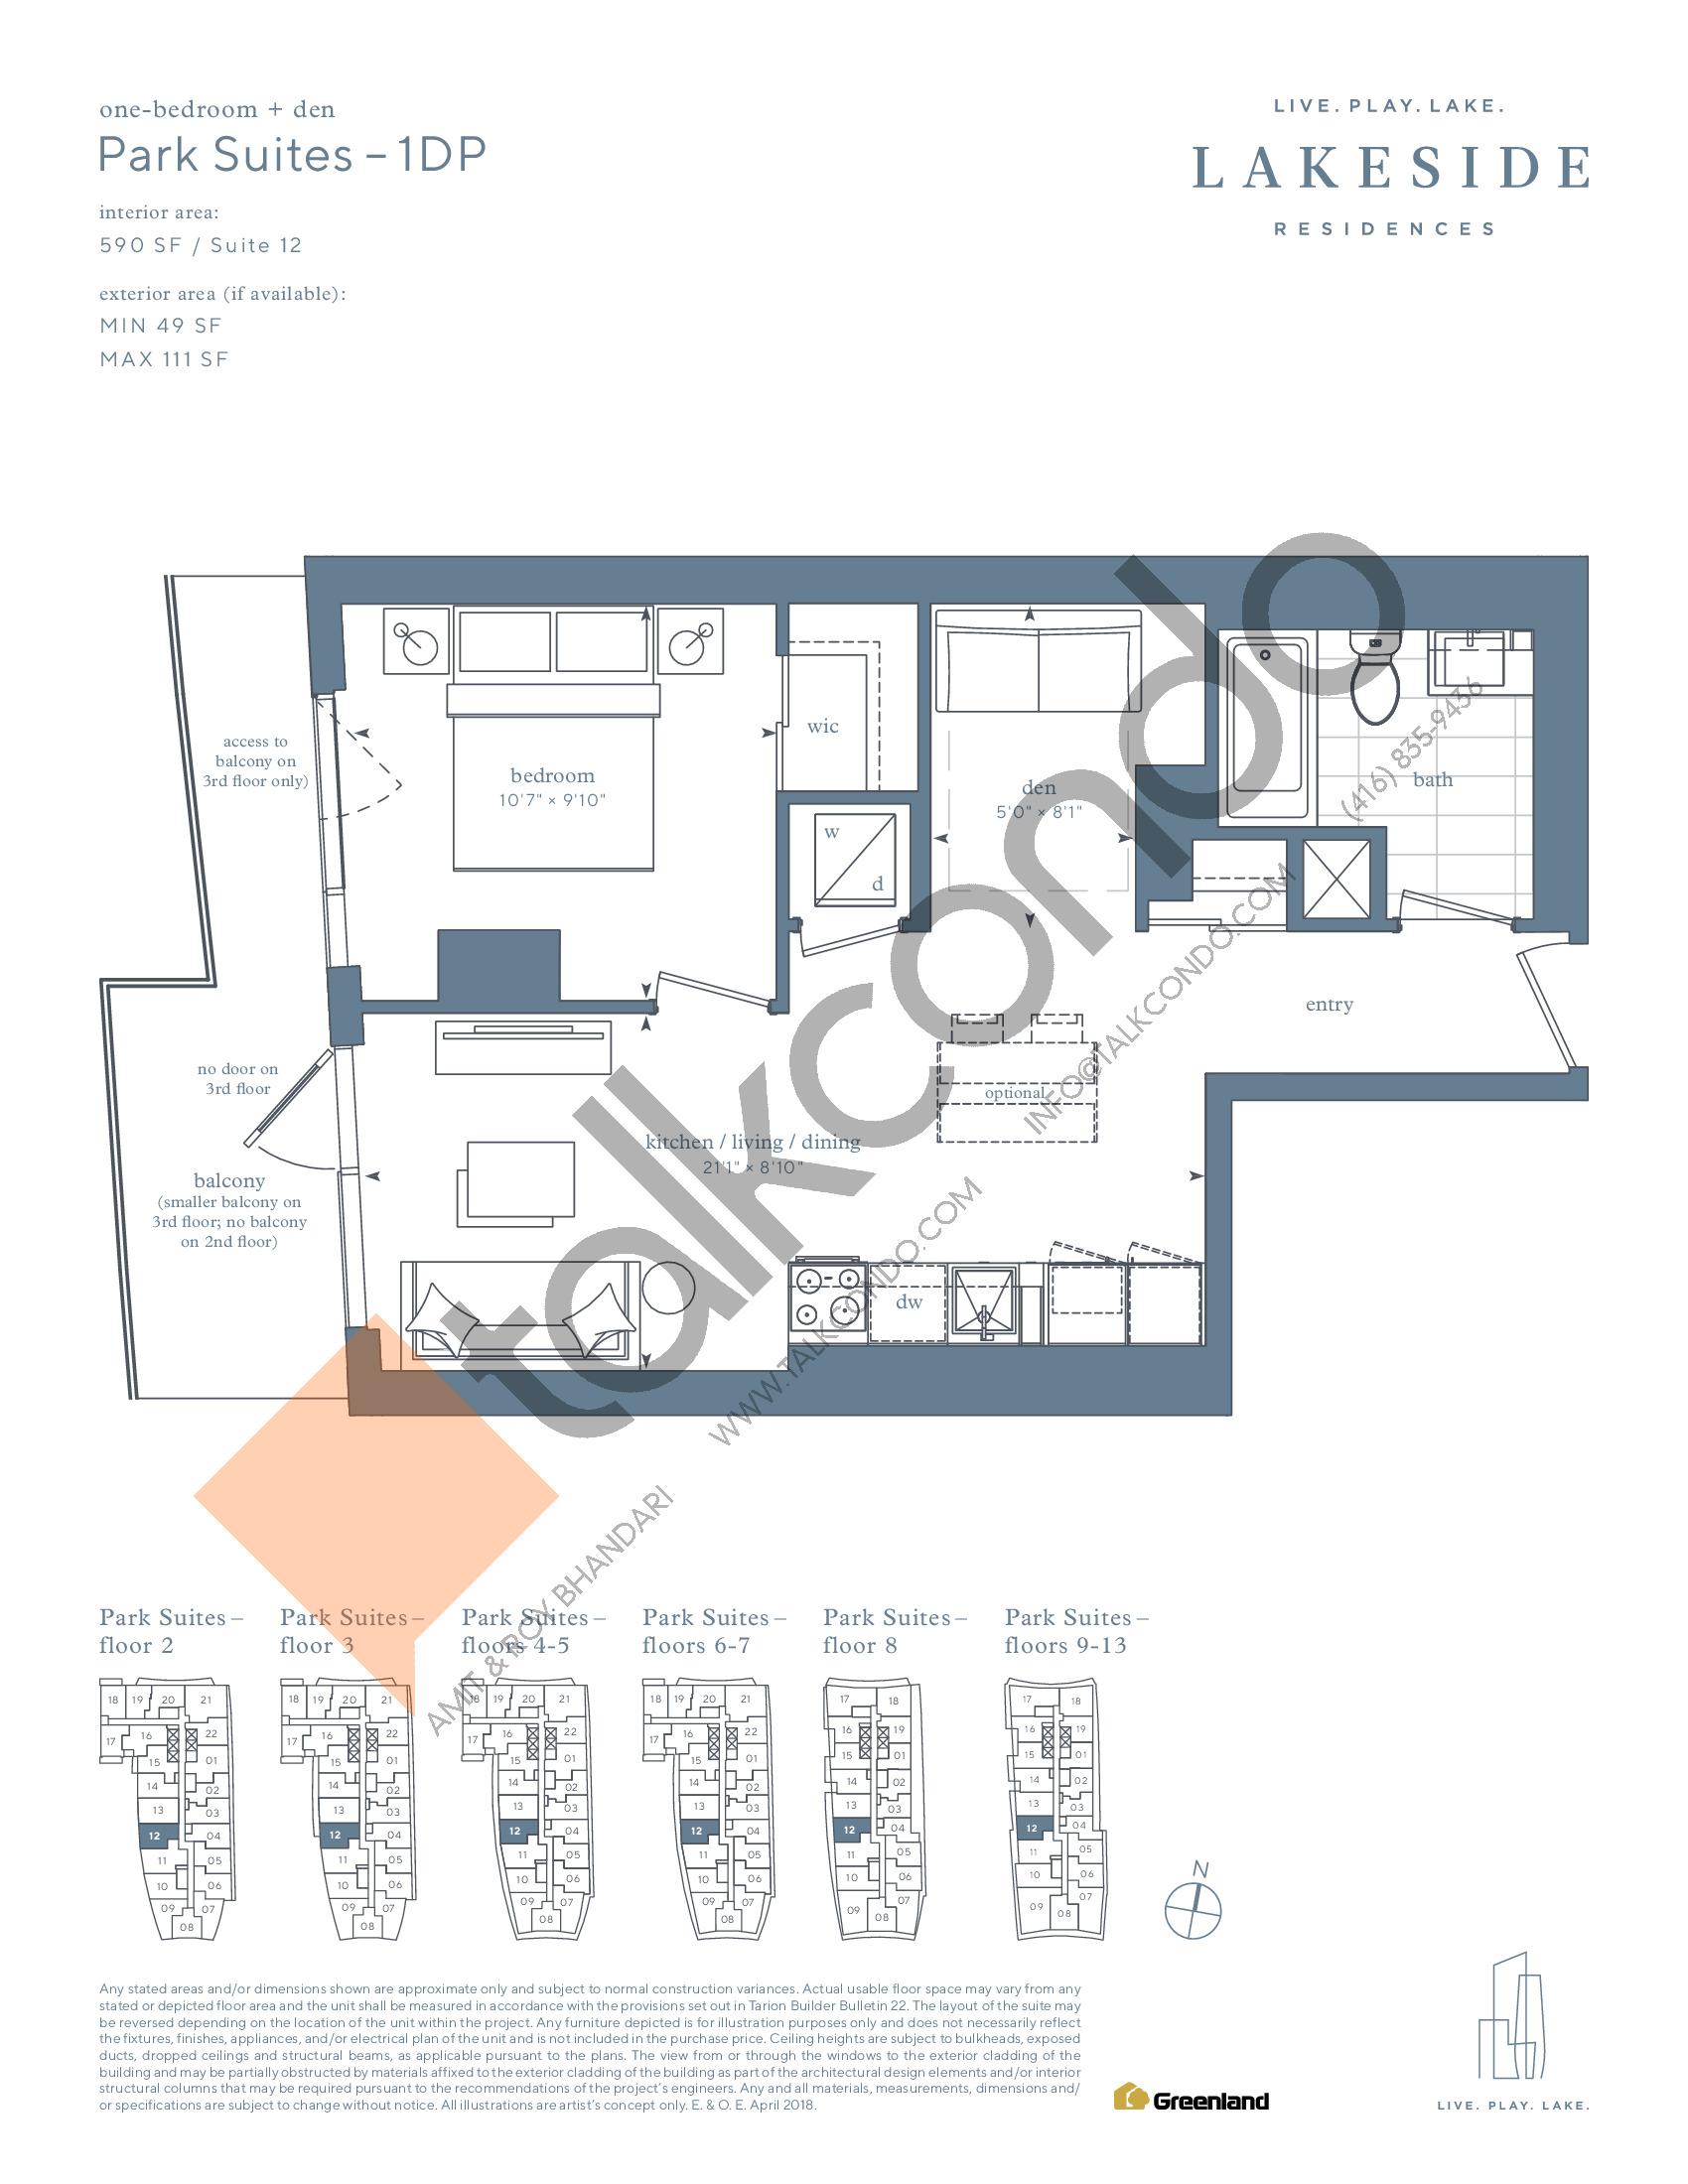 Park Suites - 1DP Floor Plan at Lakeside Residences - 590 sq.ft